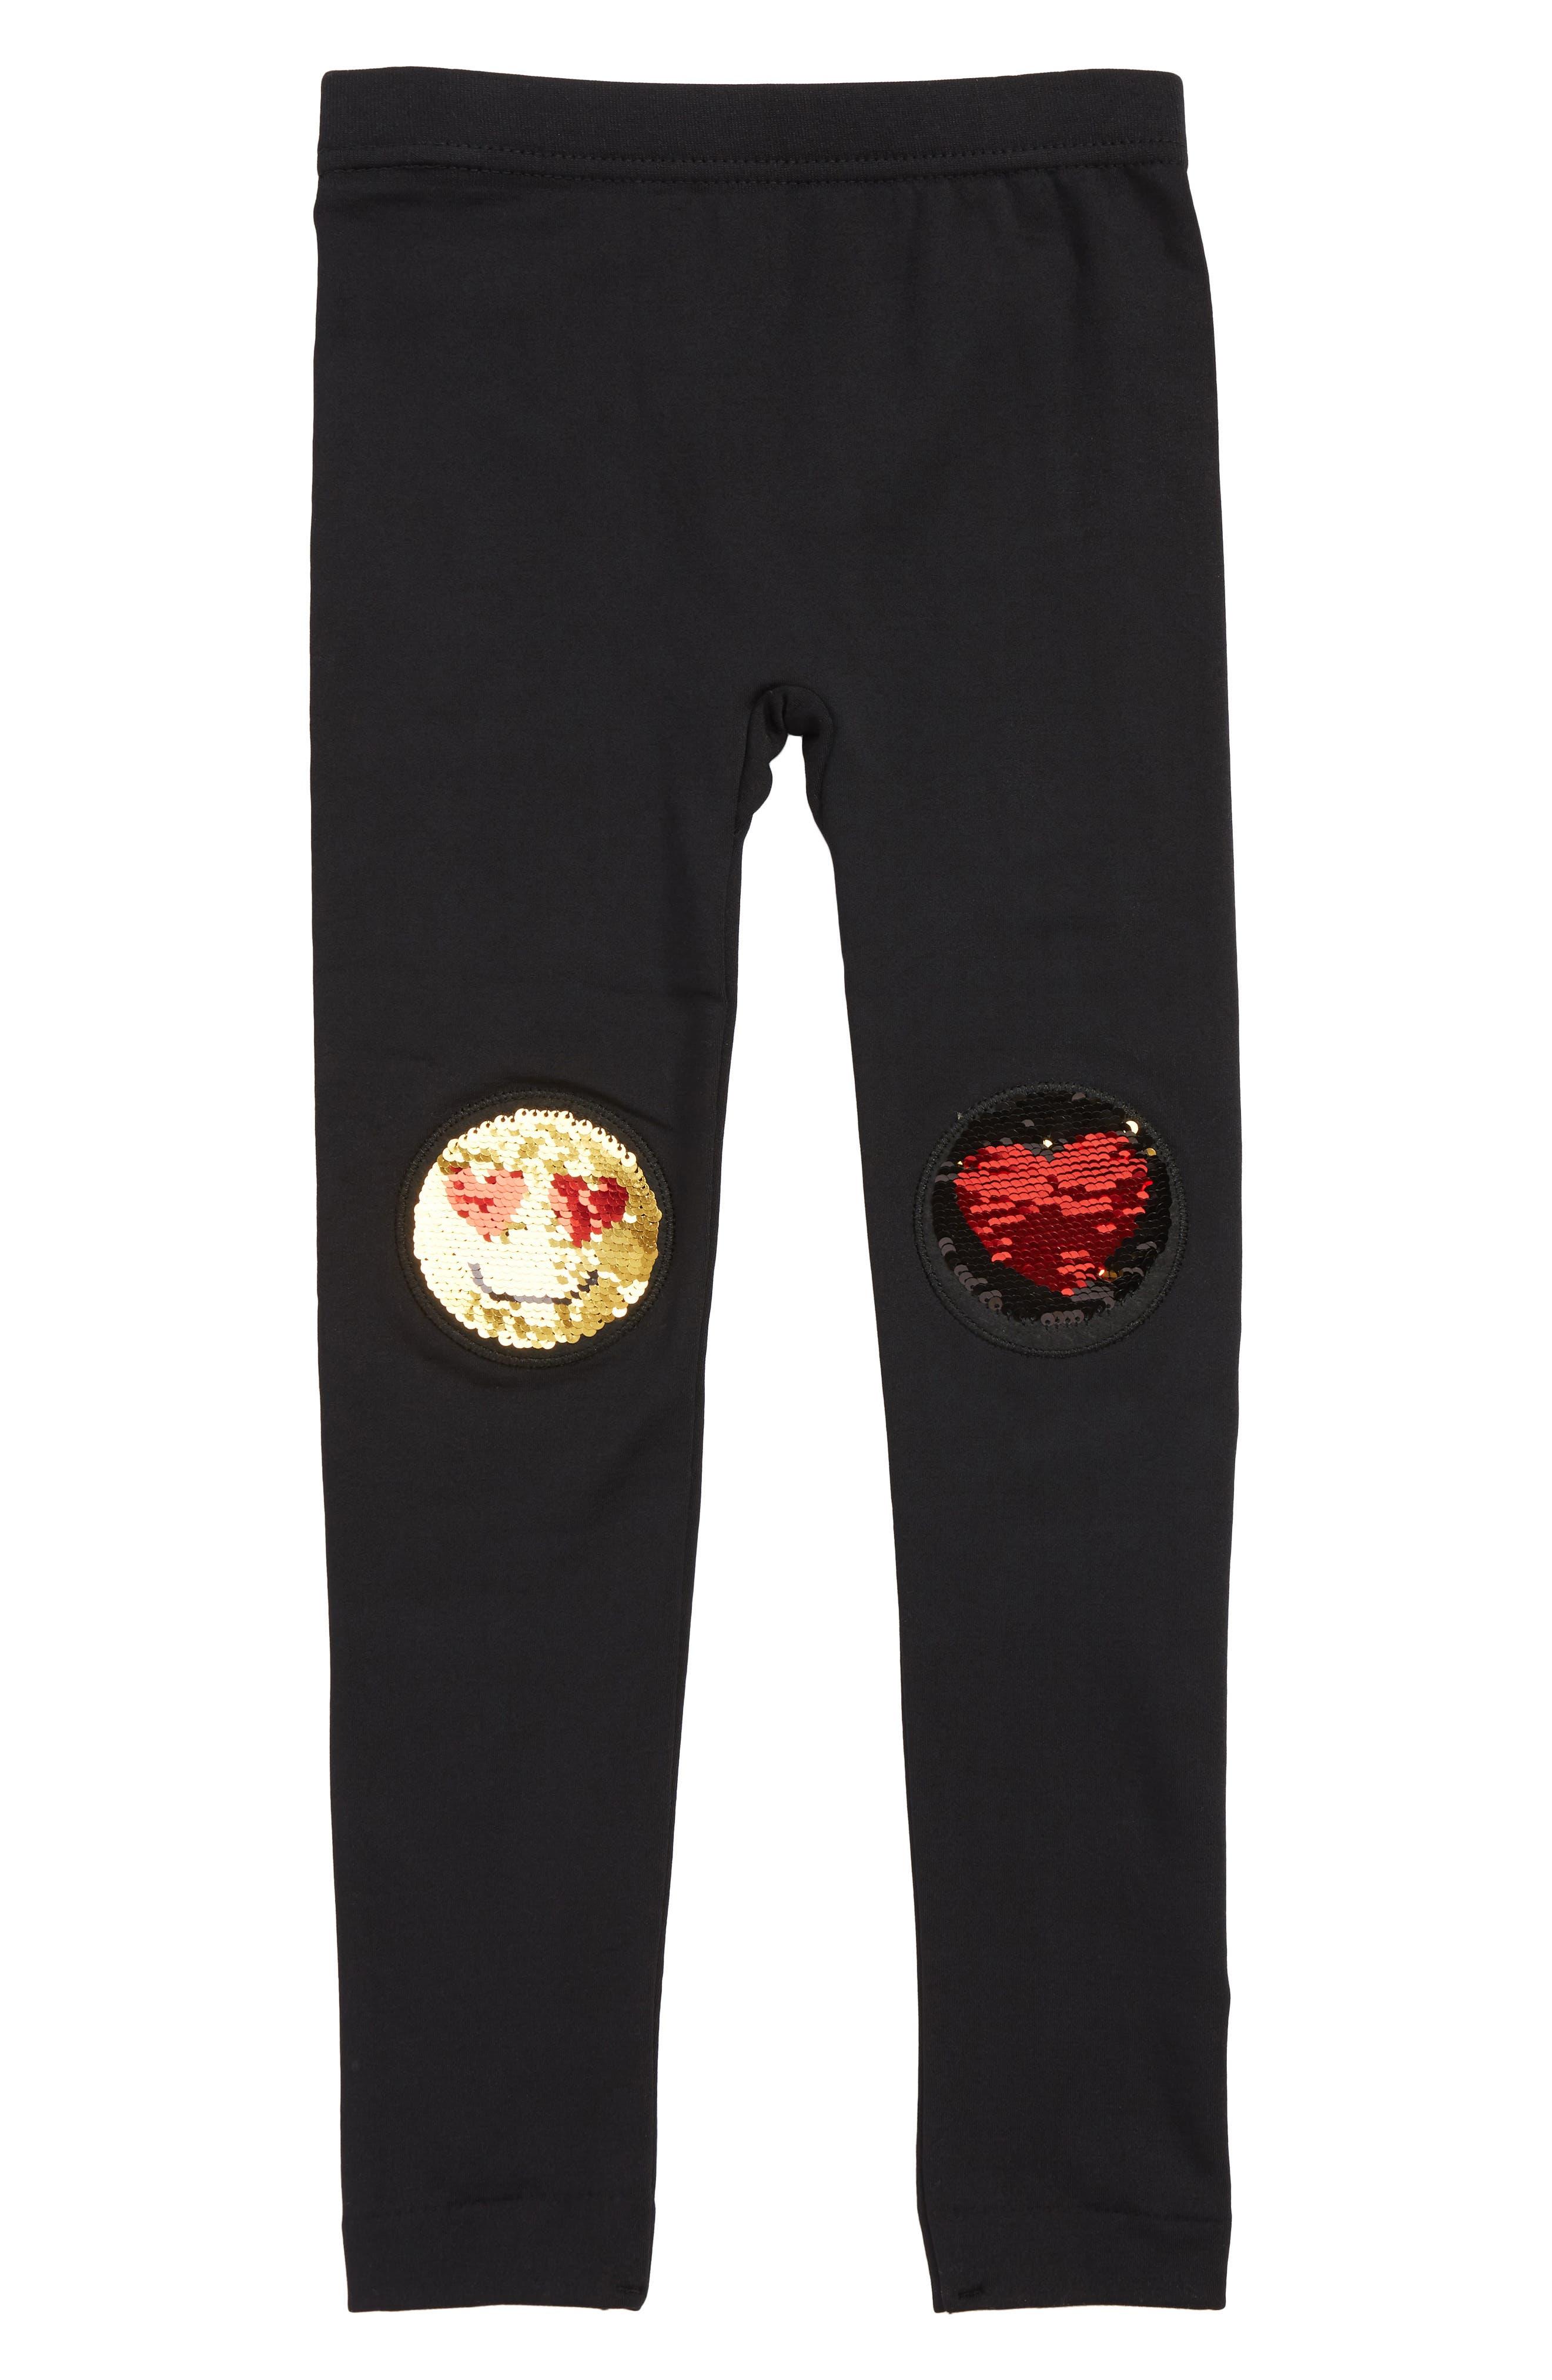 Smiley Heart Sequined Leggings,                         Main,                         color, BLACK